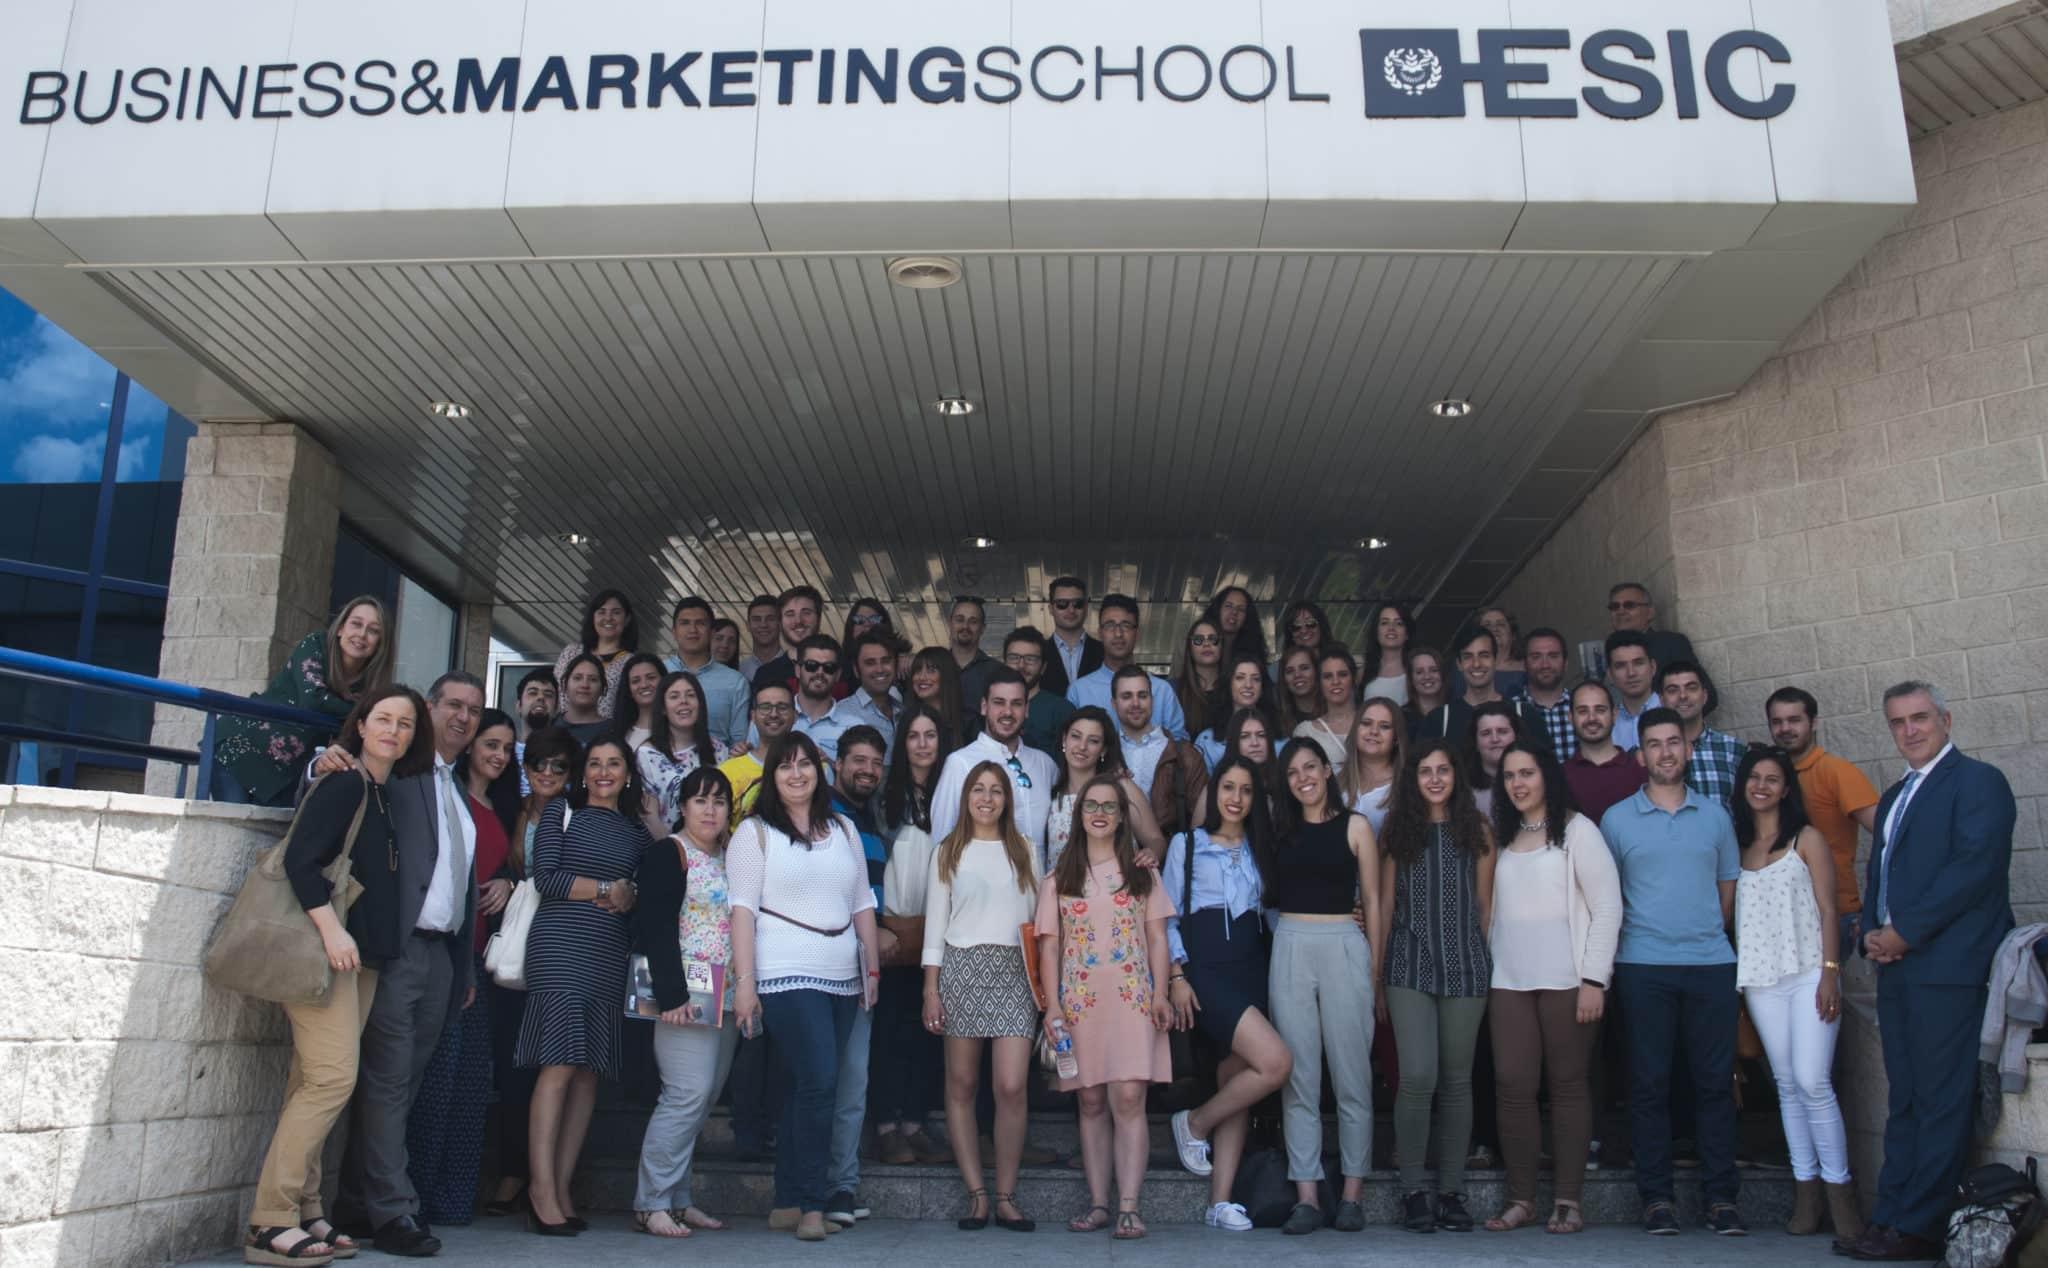 https://blog.globalcaja.es/wp-content/uploads/2019/07/ERV-ESIC-foto-de-familia.jpg